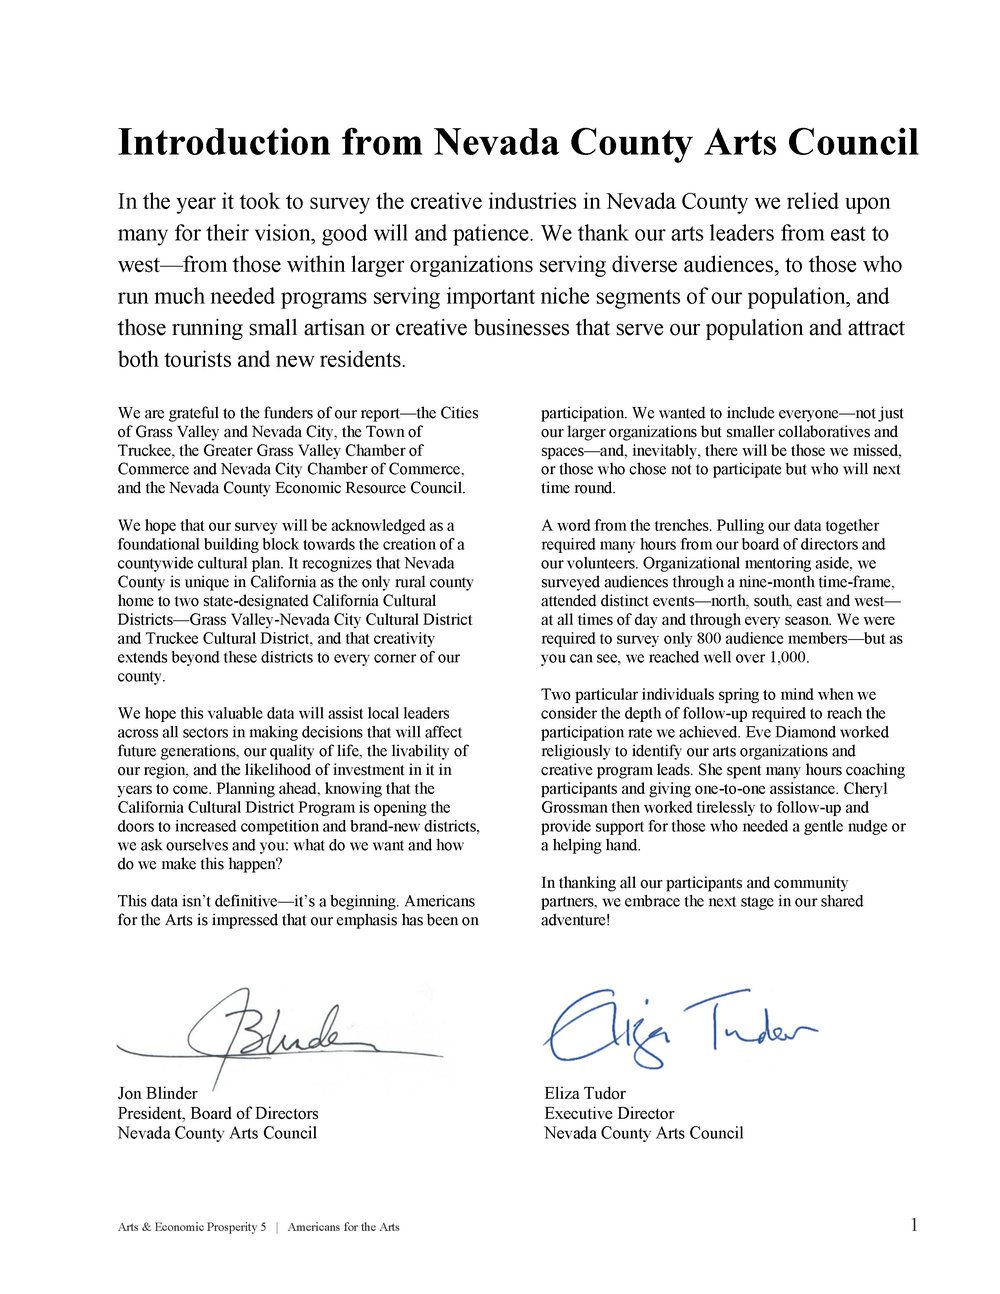 Arts & Economic Prosperity in Nevada County_Page_05.jpg